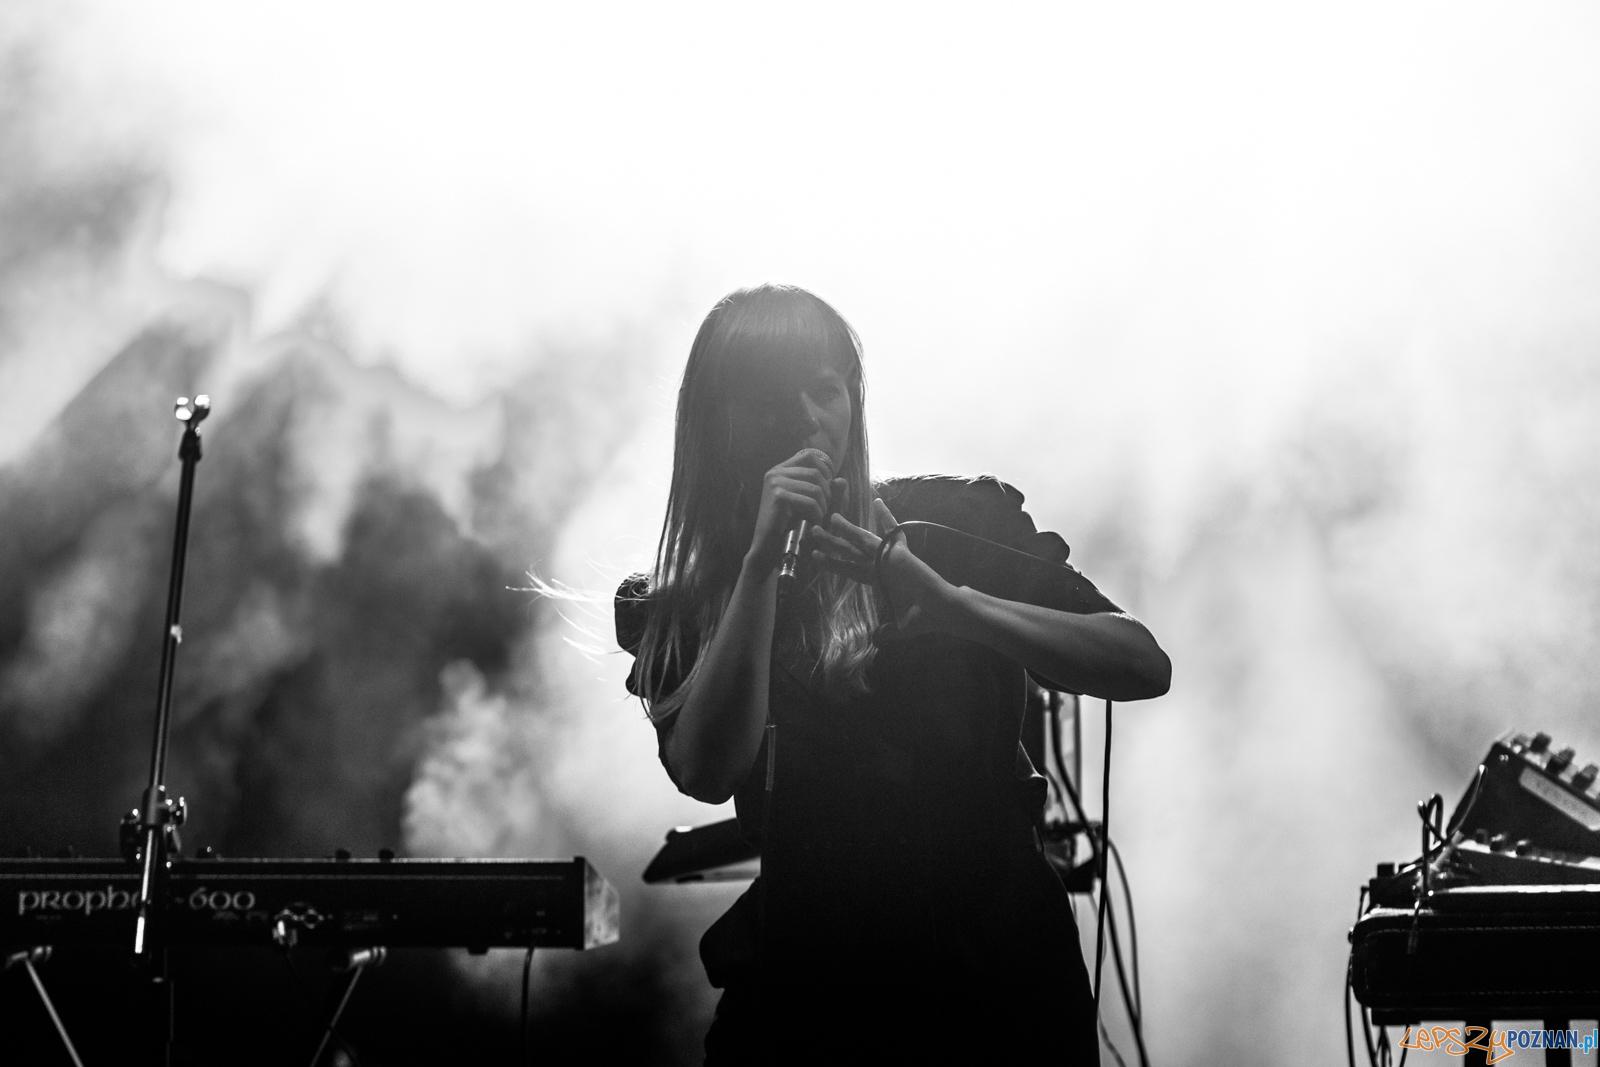 #NaFalach - Rebeka  Foto: lepszyPOZNAN.pl/Piotr Rychter